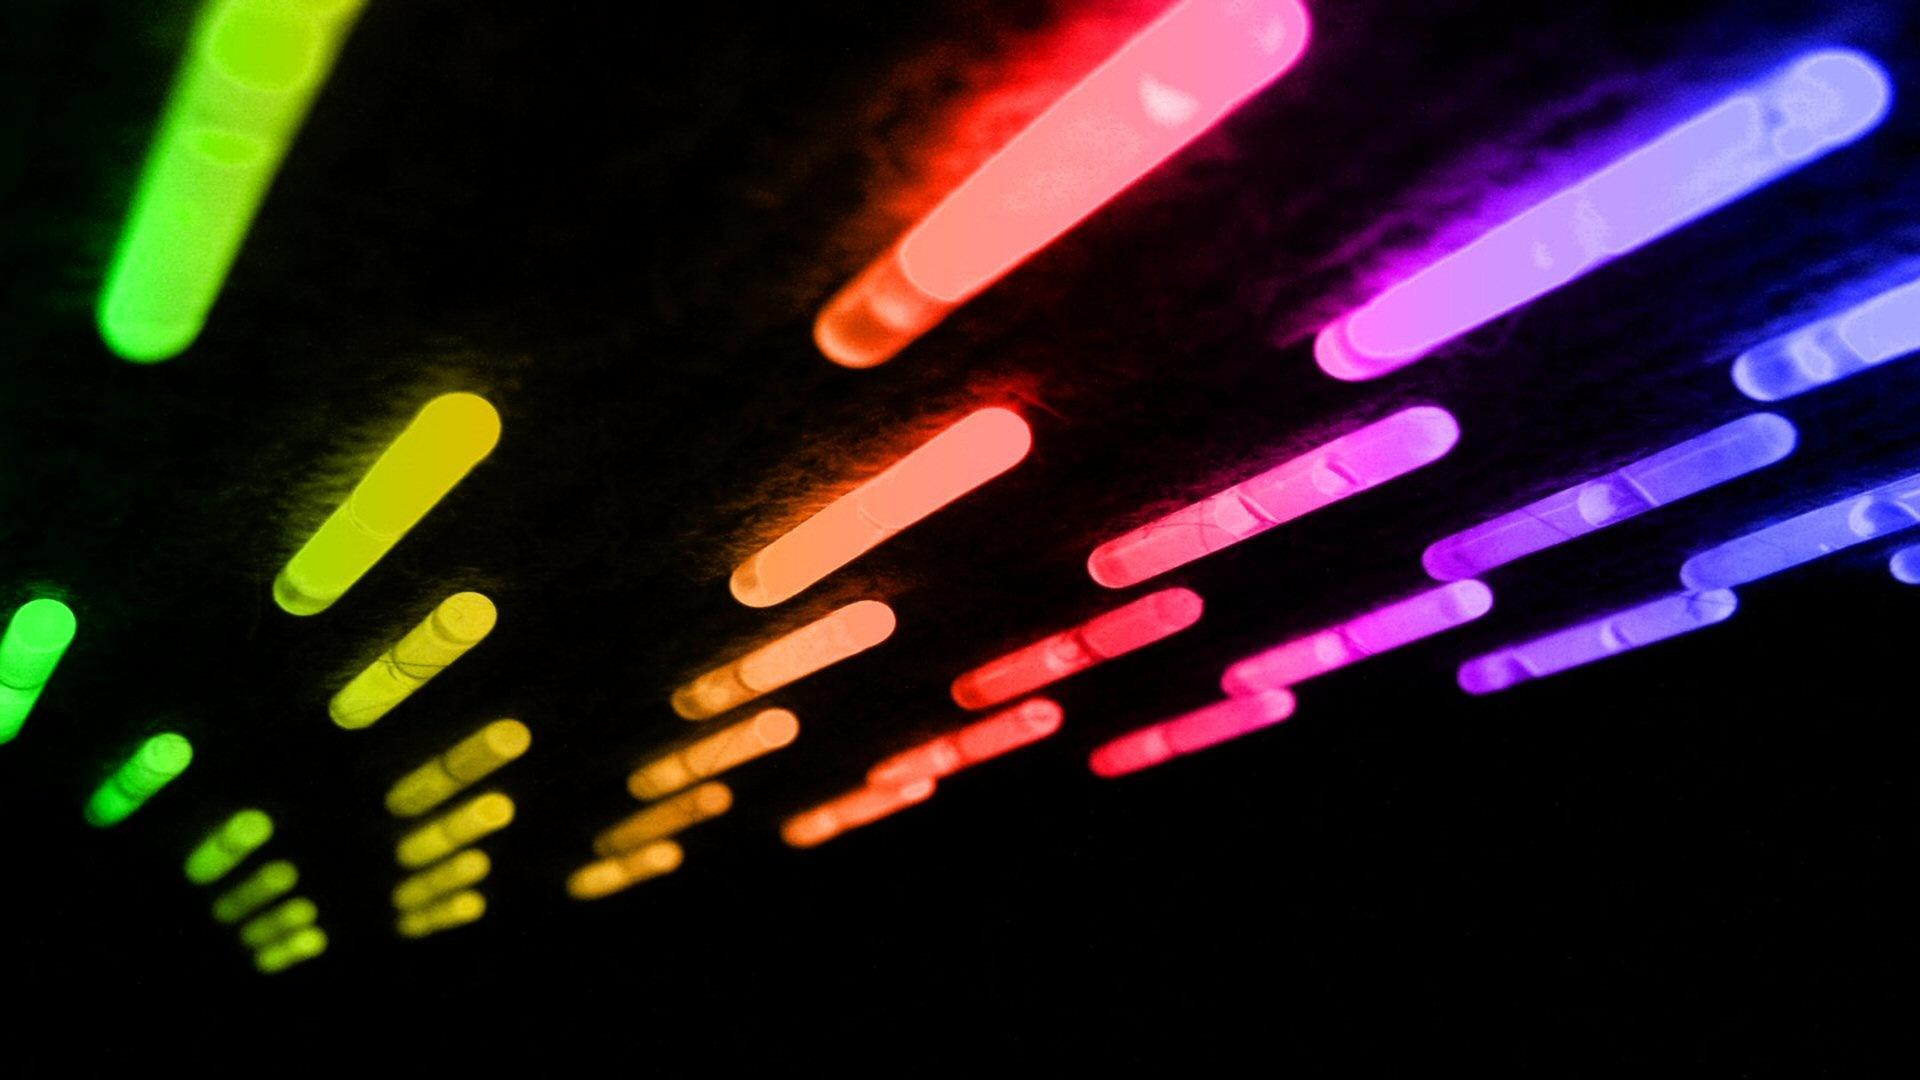 Glow In The Dark Background Wallpaper HD